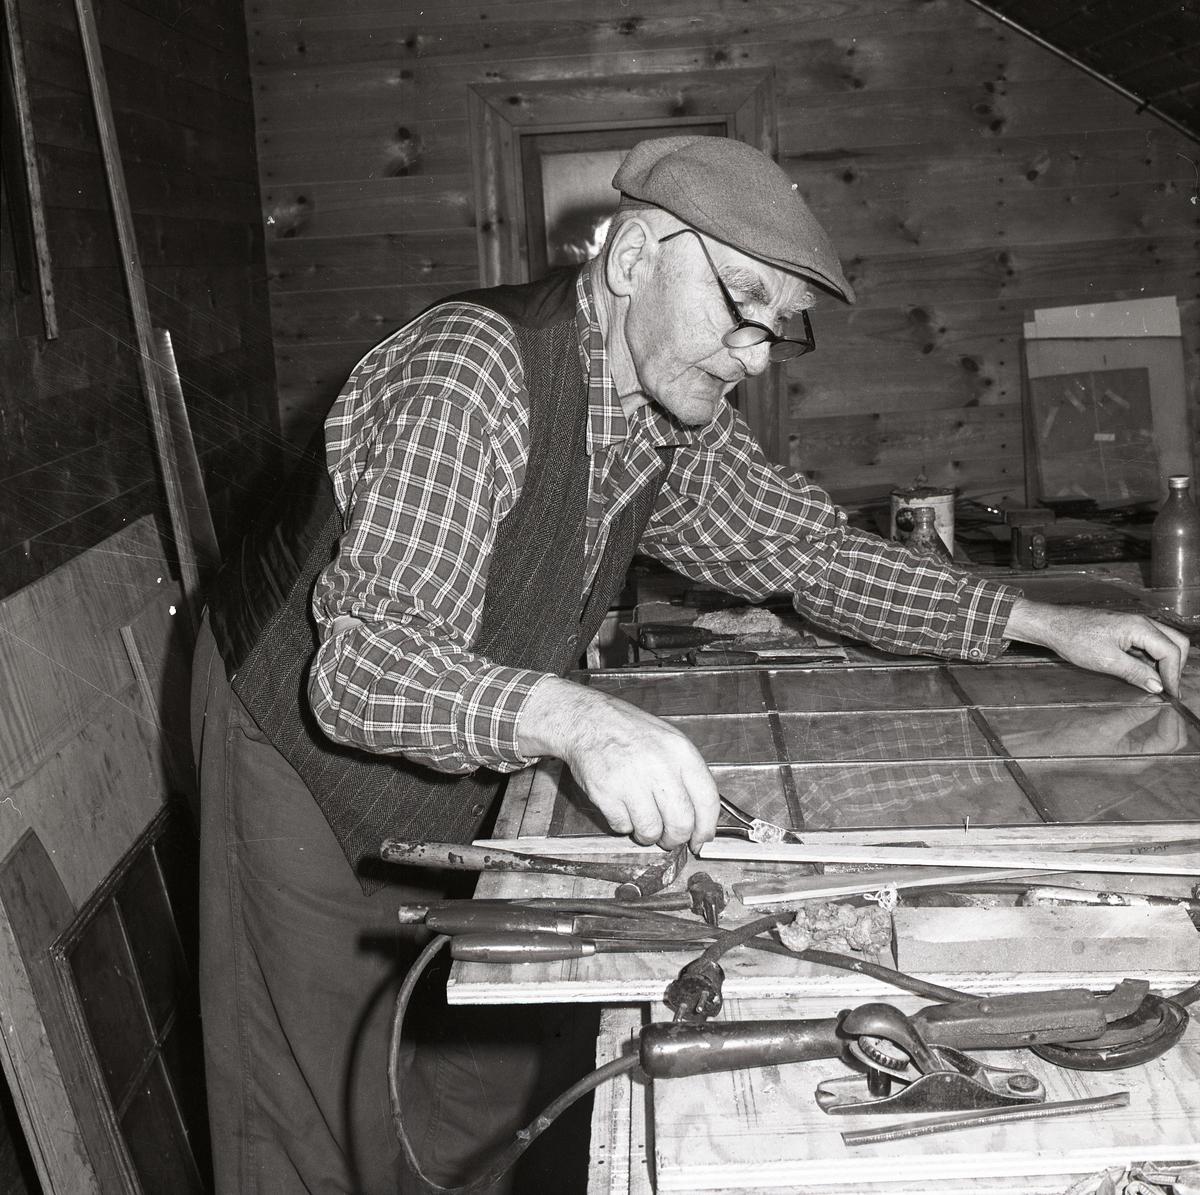 En man arbetar koncentrerat vid en bänk, 1968.